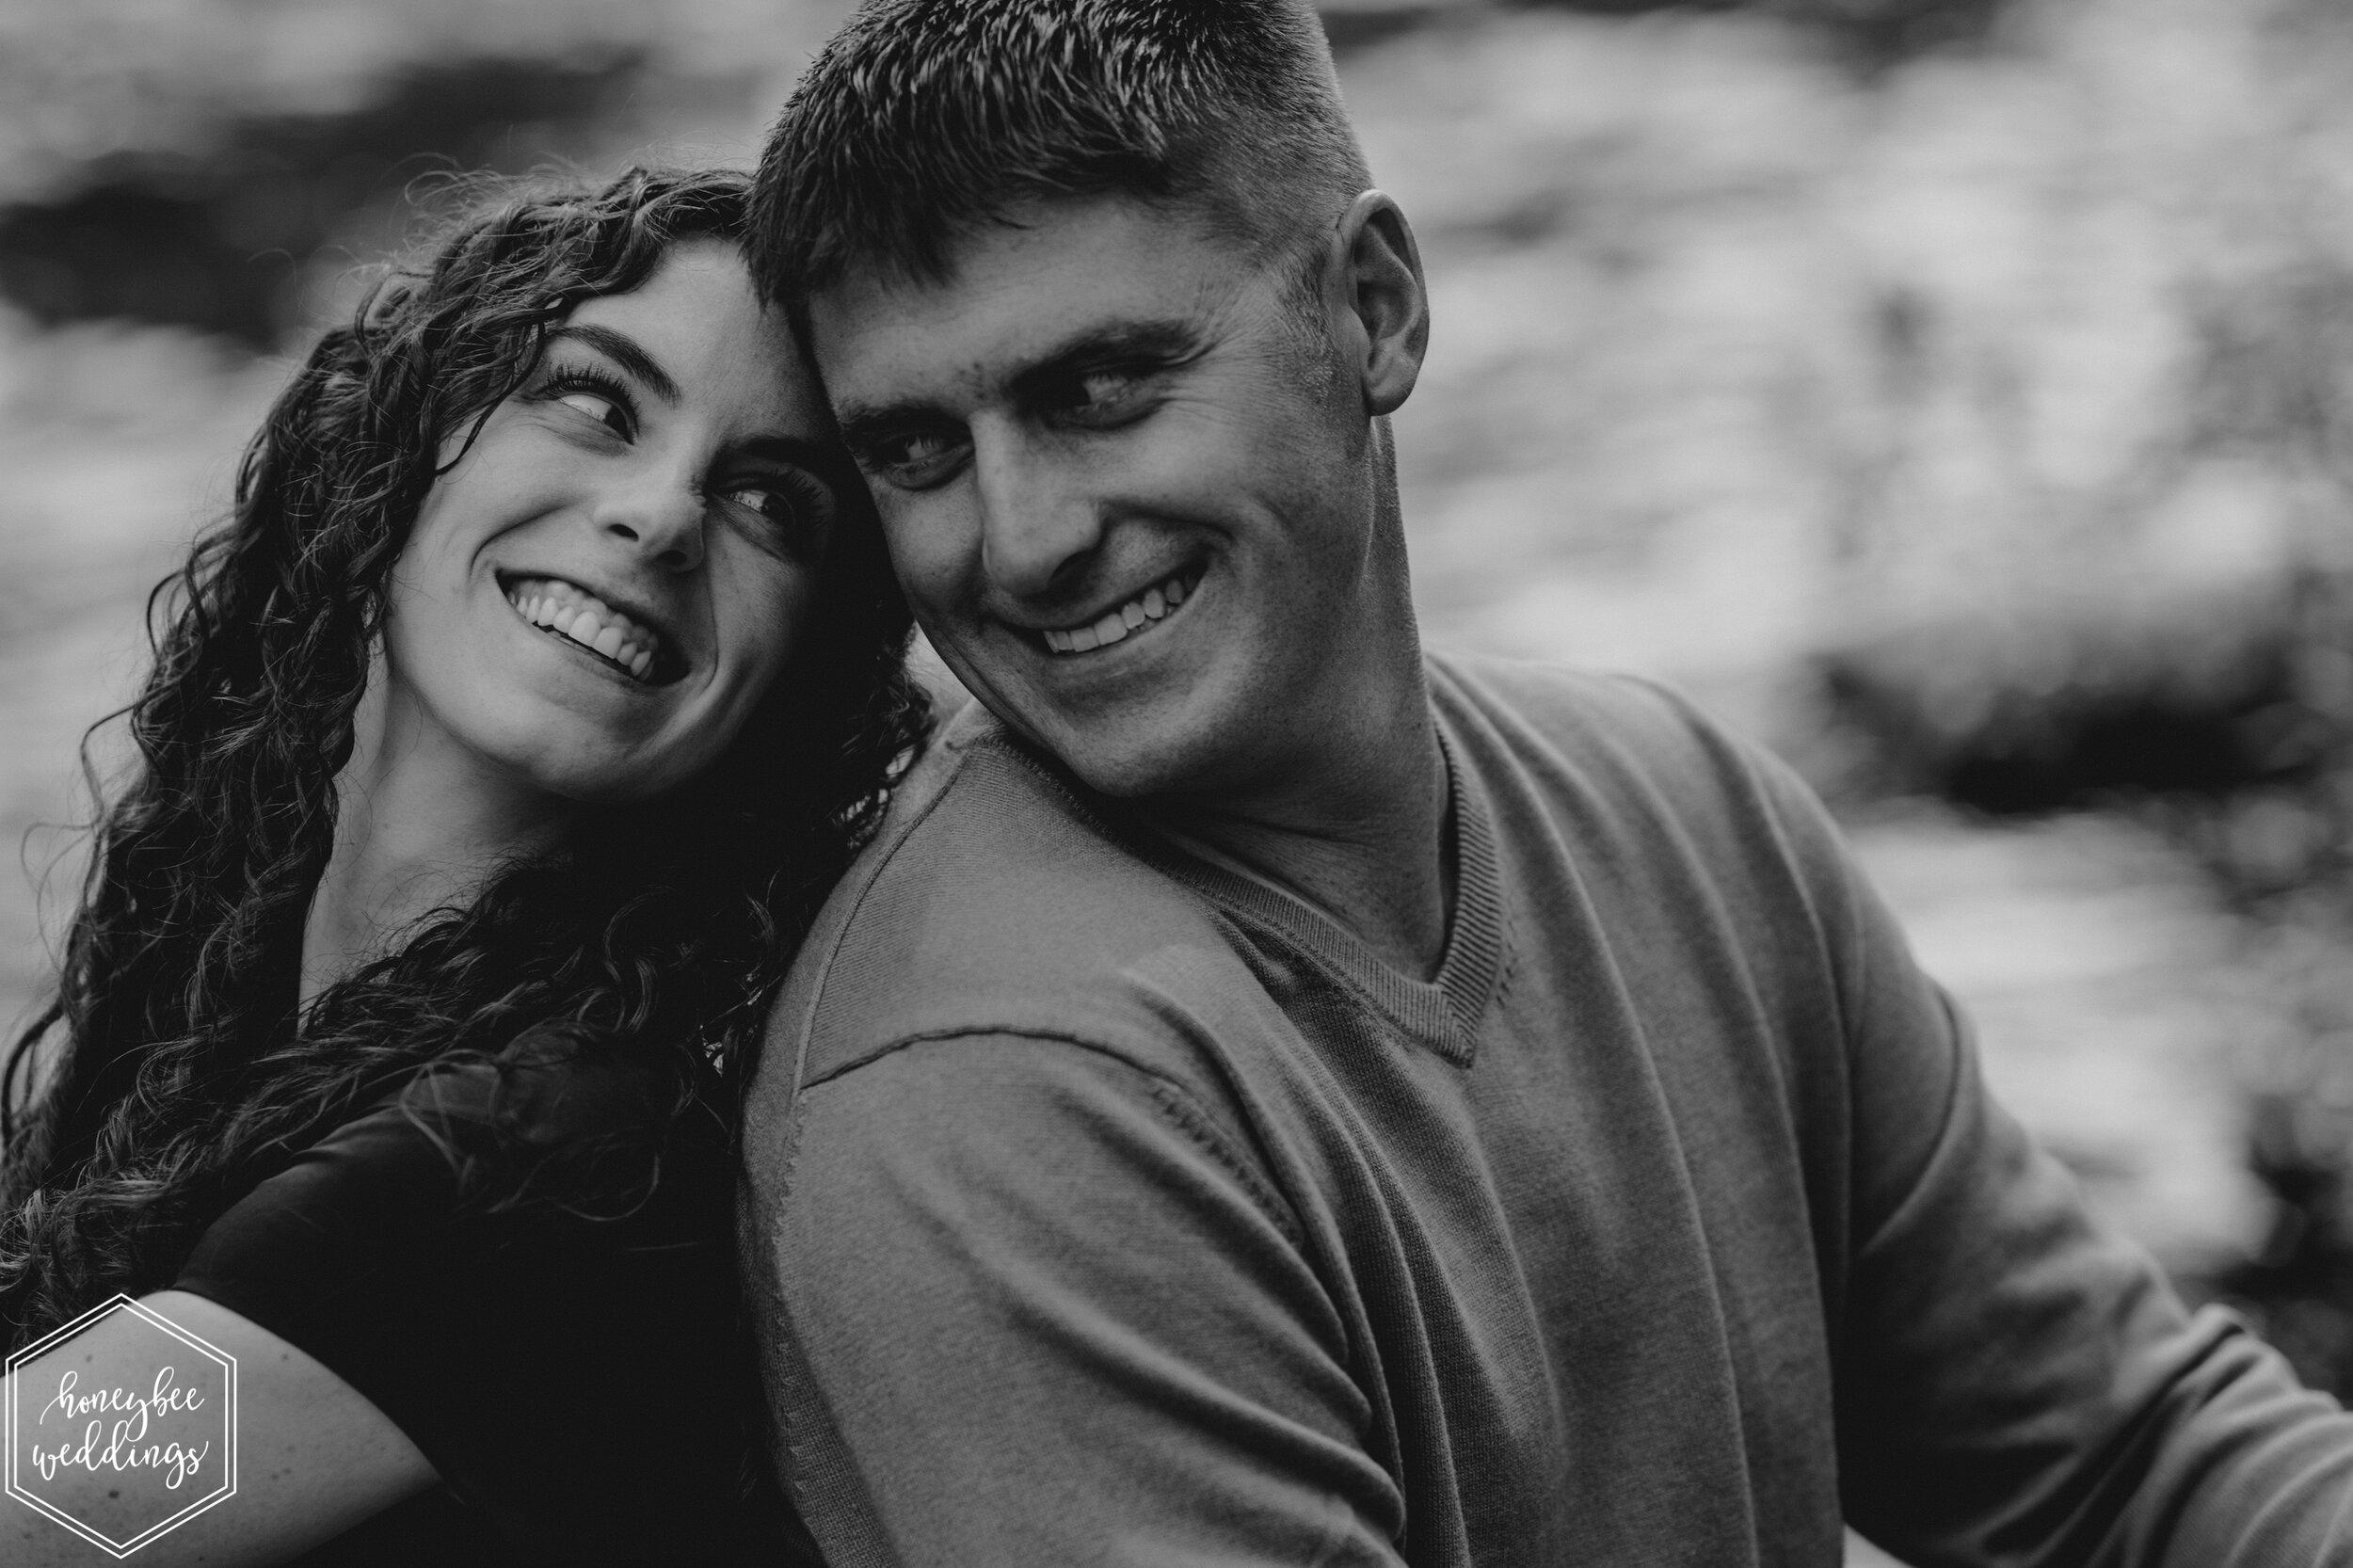 004Rock Creek Engagement_Fall Engaegment Session_Ann & Nick_September 22, 2019-23.jpg